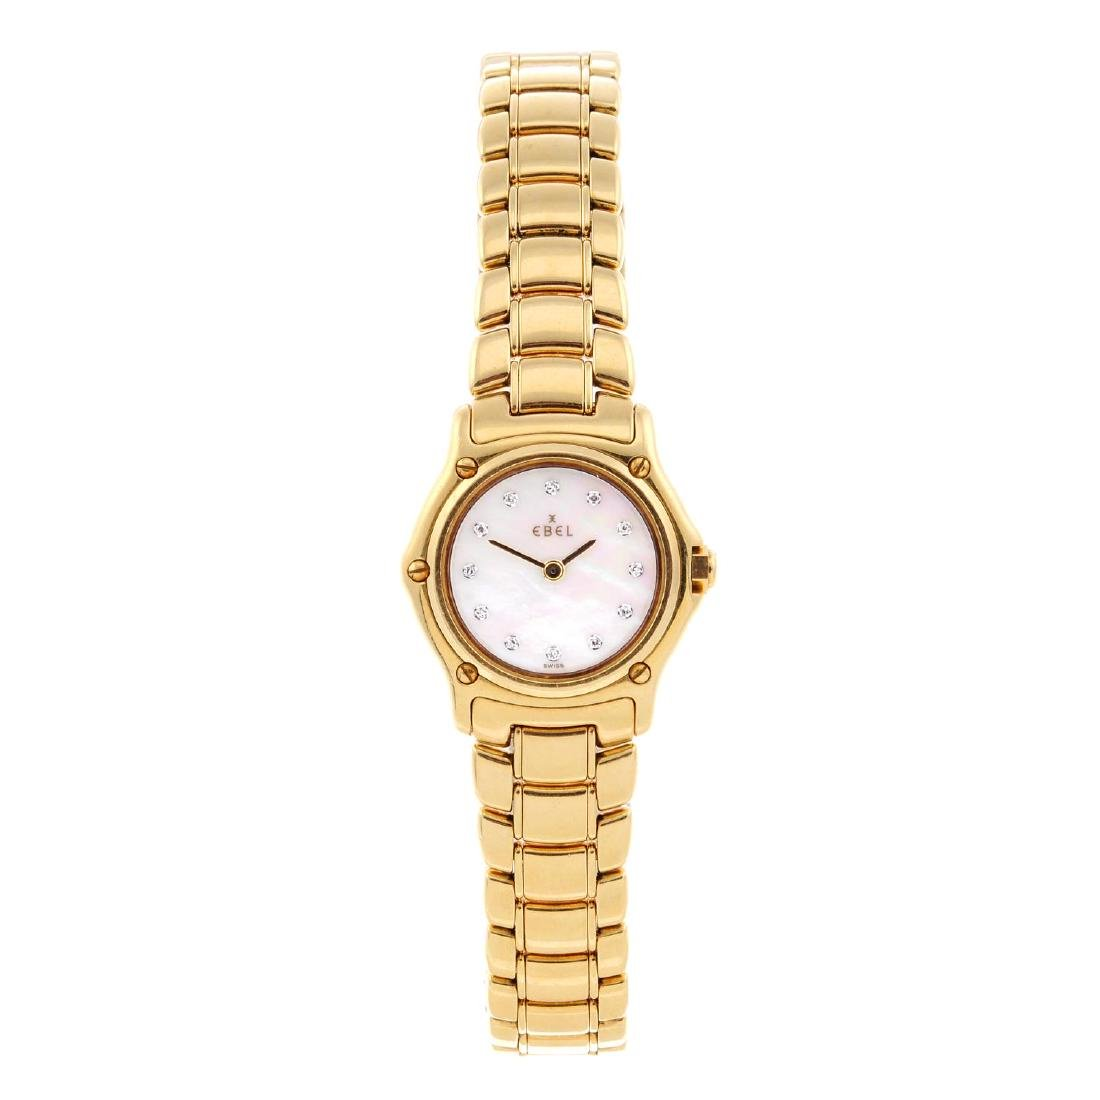 EBEL - a lady's Classic Sport bracelet watch. 18ct